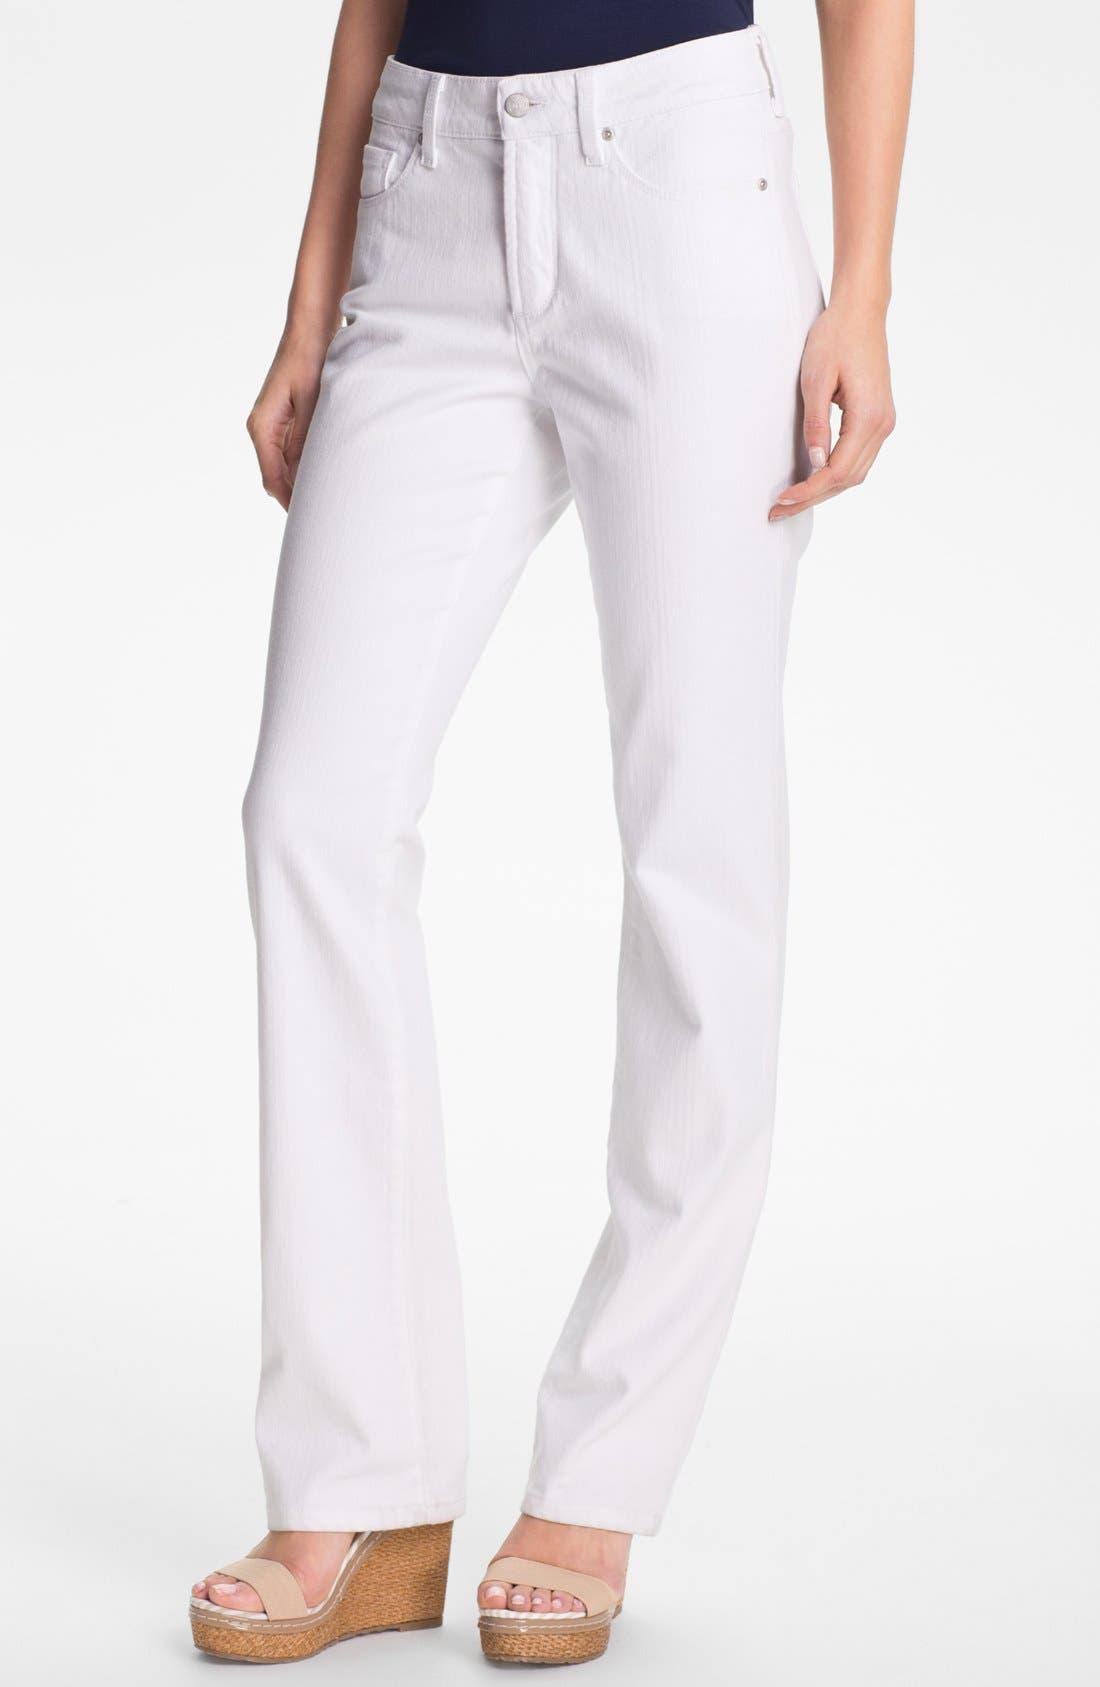 Alternate Image 1 Selected - NYDJ 'Marilyn' Straight Leg Stretch Jeans (Petite)